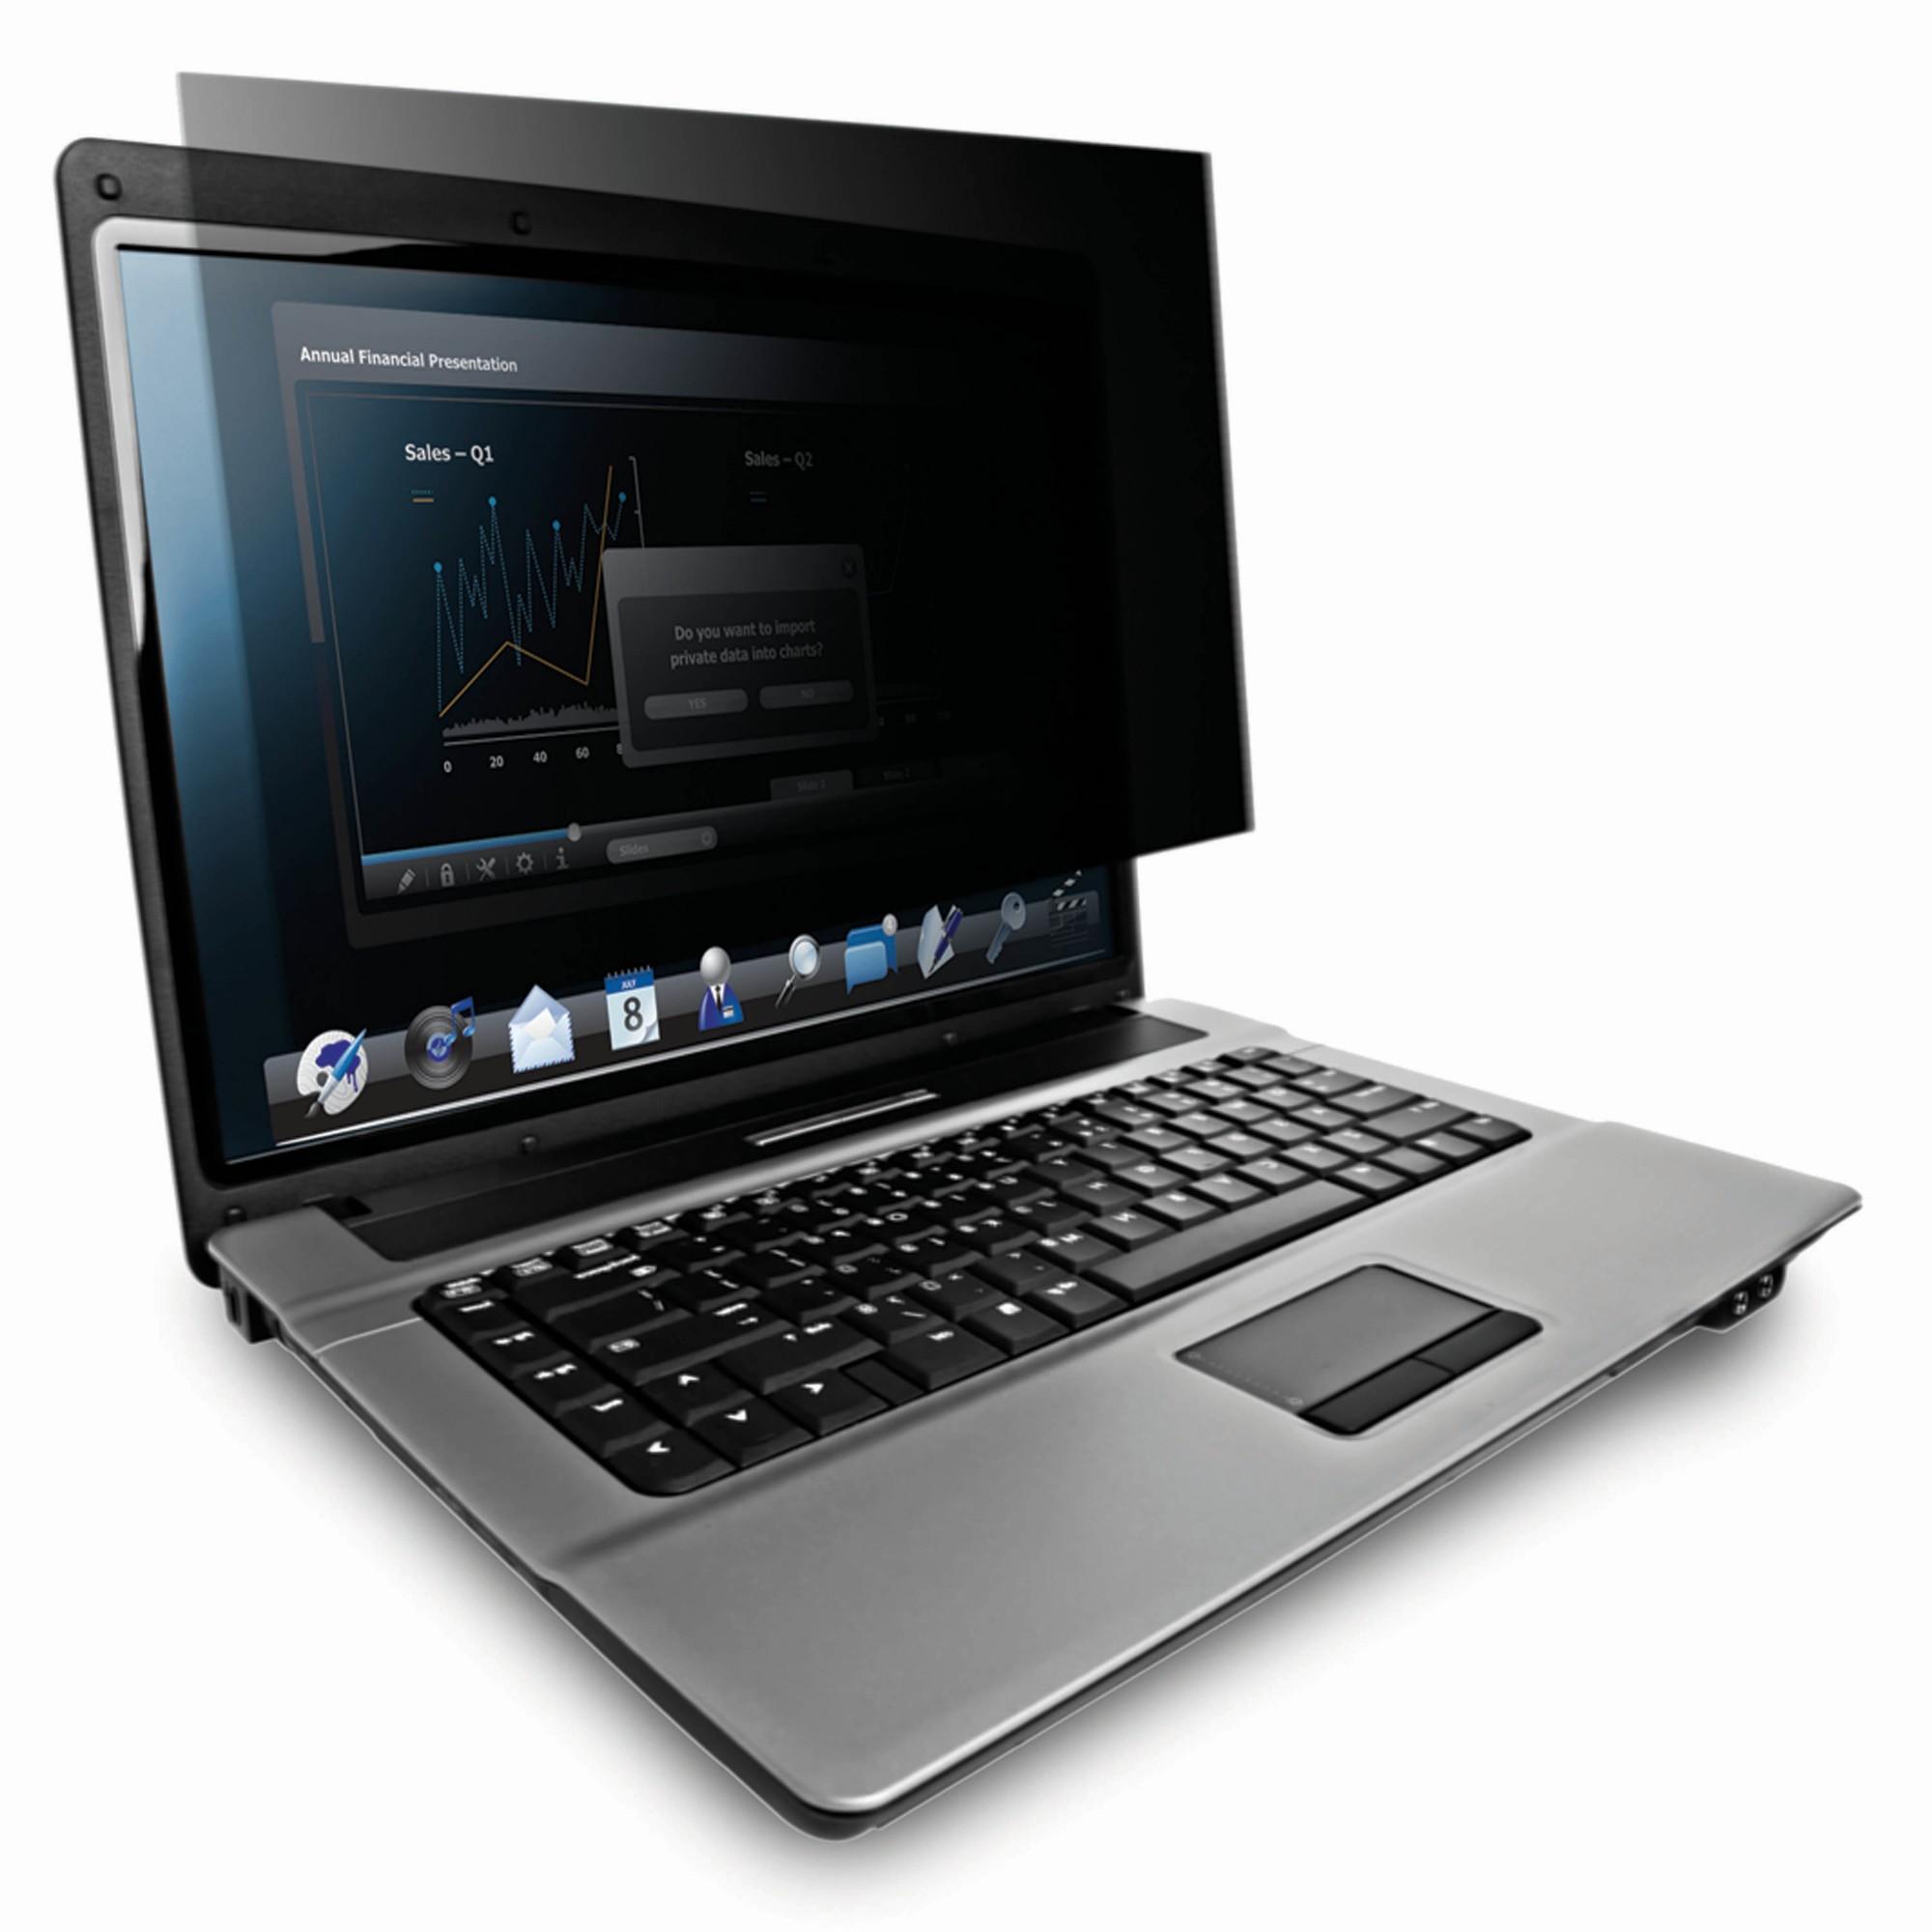 Netbook Privacy Filter Pf11.6w9 11.6in 16:9 Raio Monitor